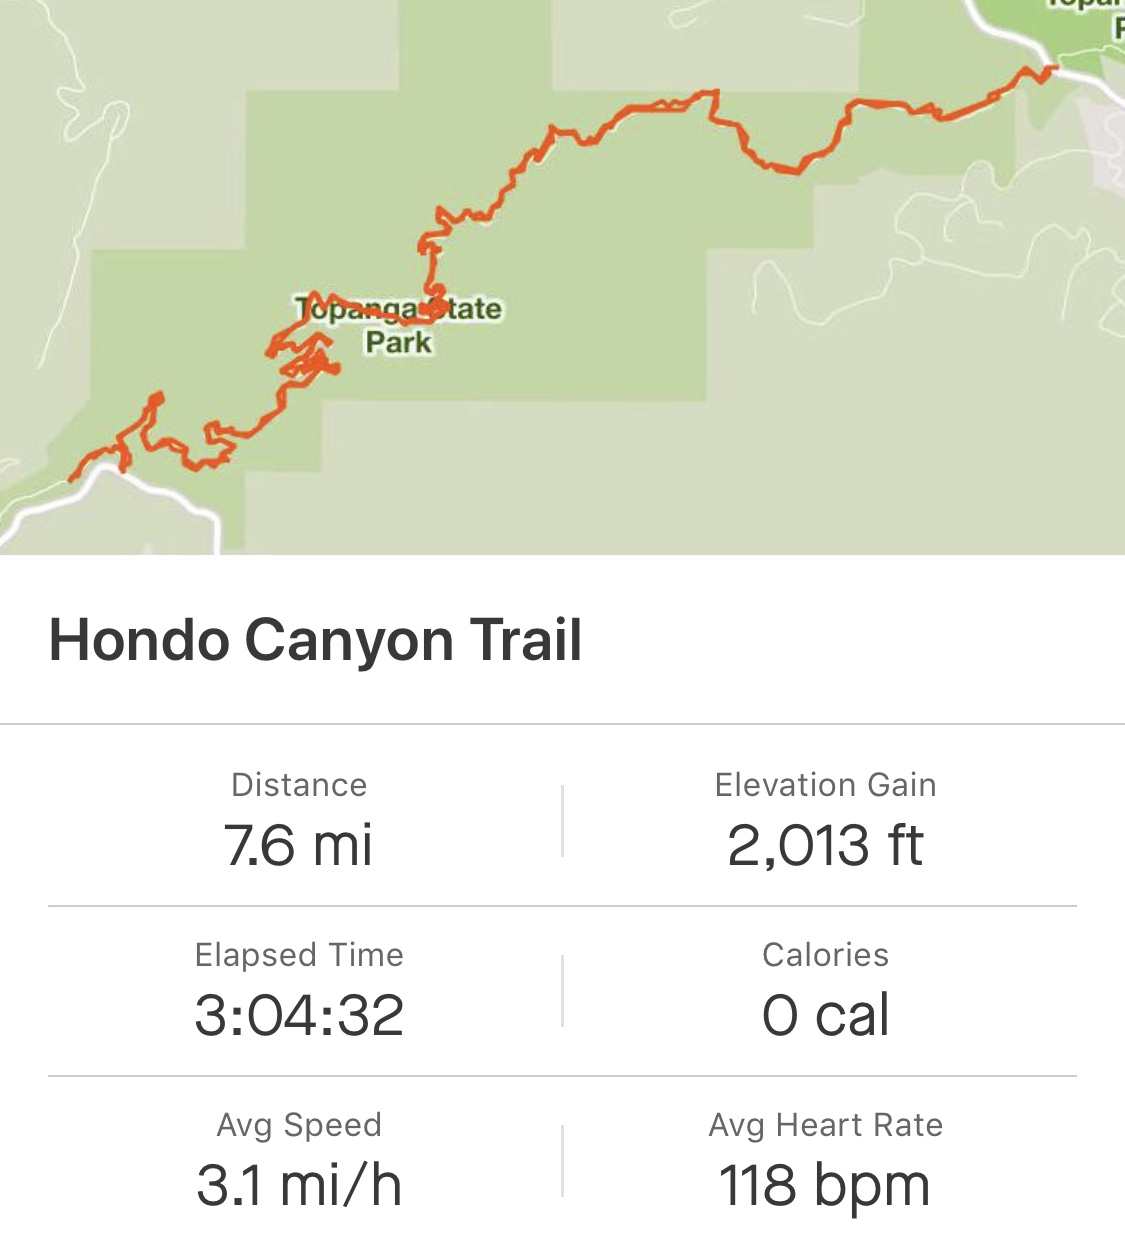 Topanga State Park Hiking - Endless hiking in the Santa Monica Mountains